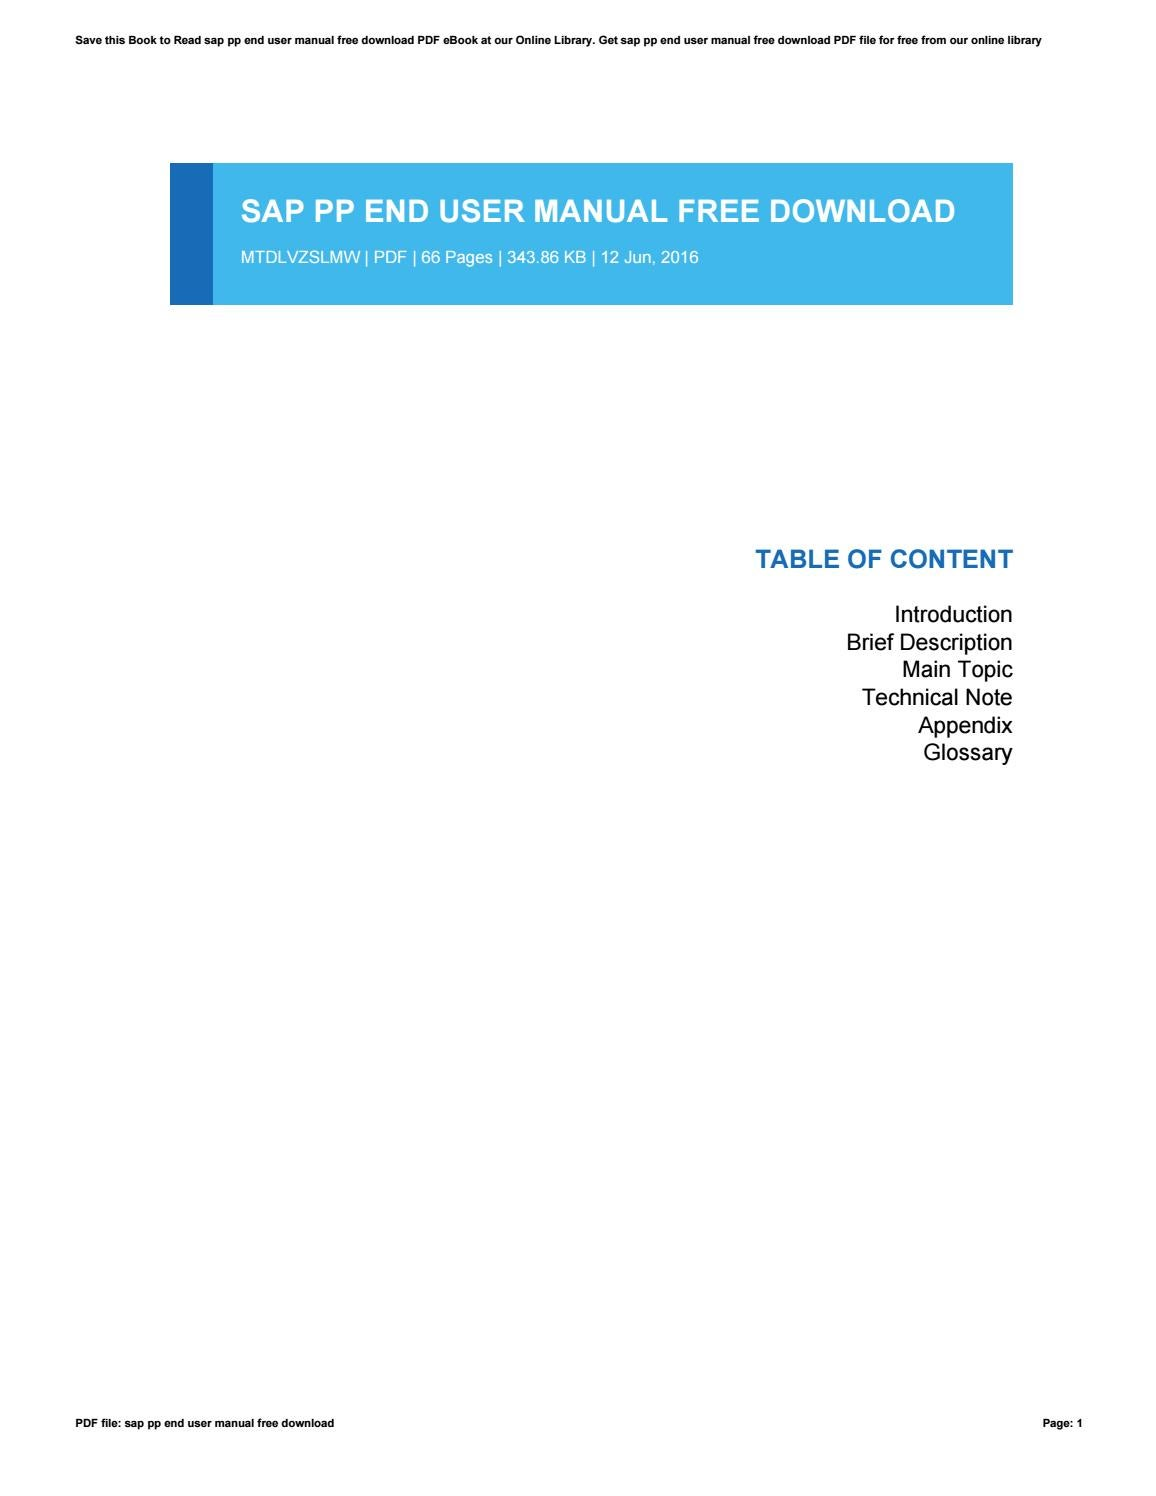 Sap pp end user manual free download by monadi98 - issuu